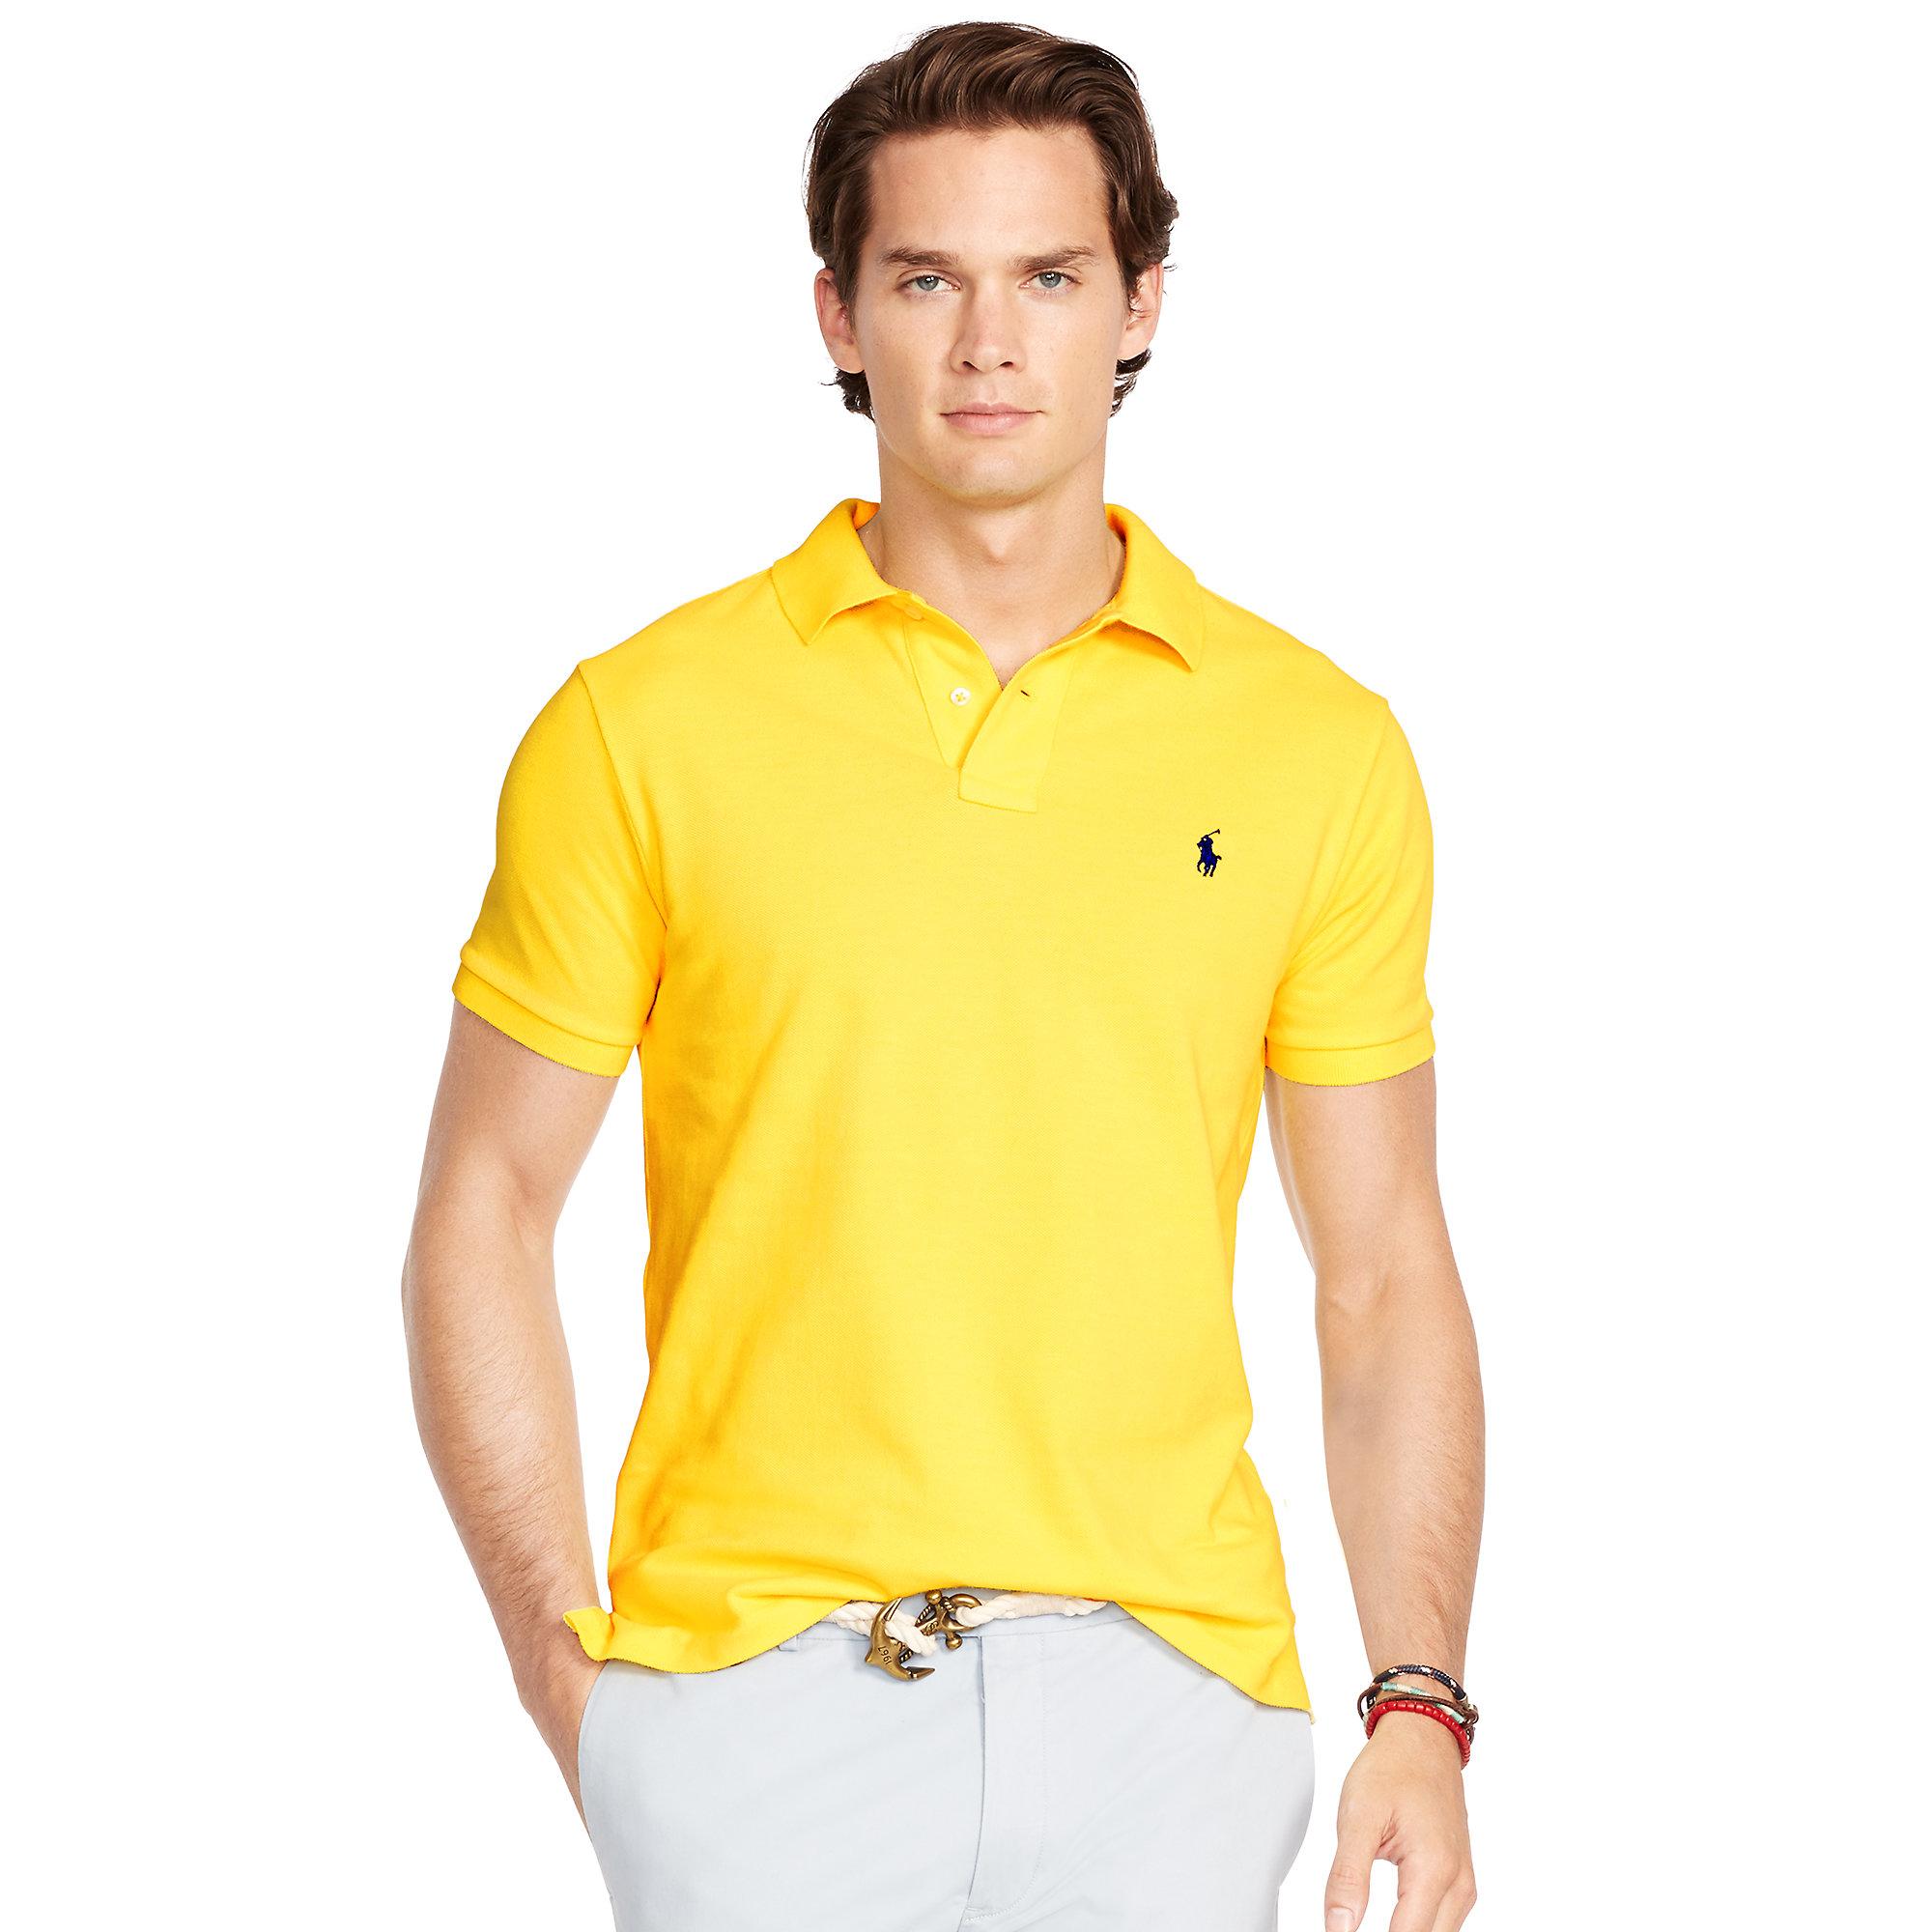 ed1cae4b7d12f ... australia lyst polo ralph lauren slim fit mesh polo shirt in yellow for  men 3d589 f8432